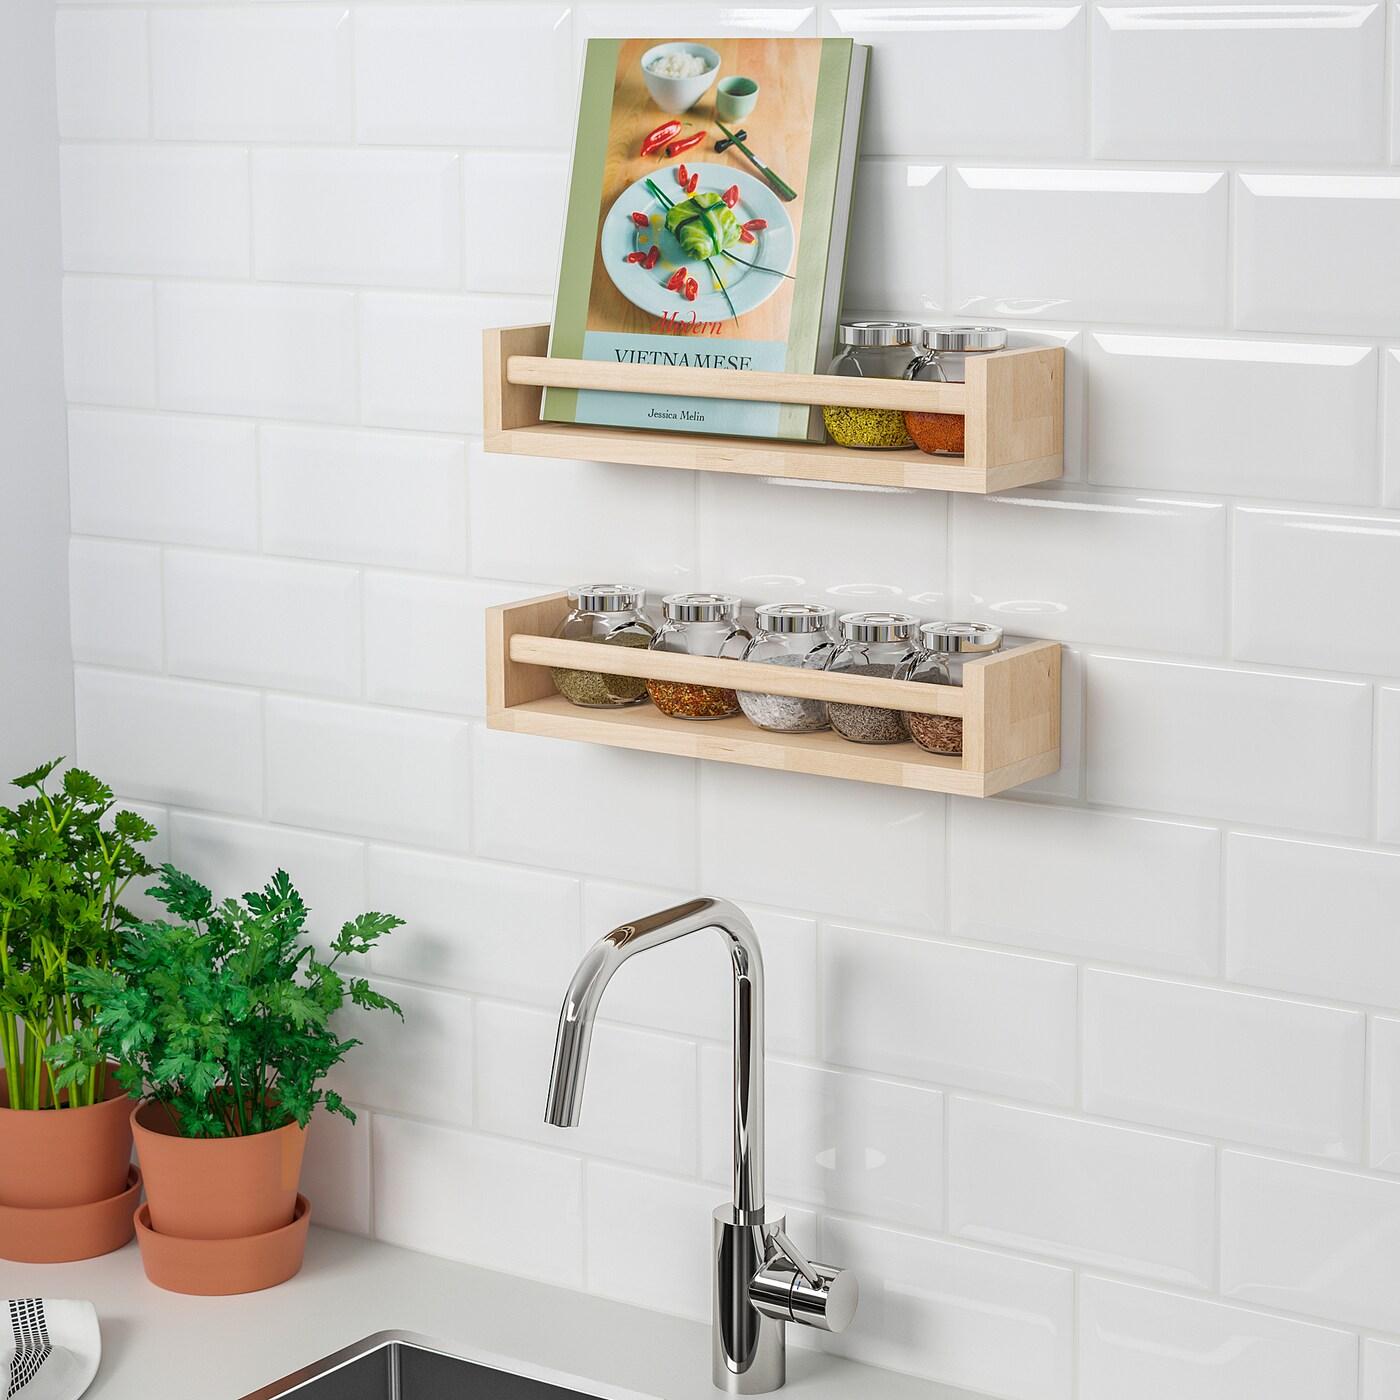 Mensole Ikea Cucina Prezzi bekvÄm spice rack - birch